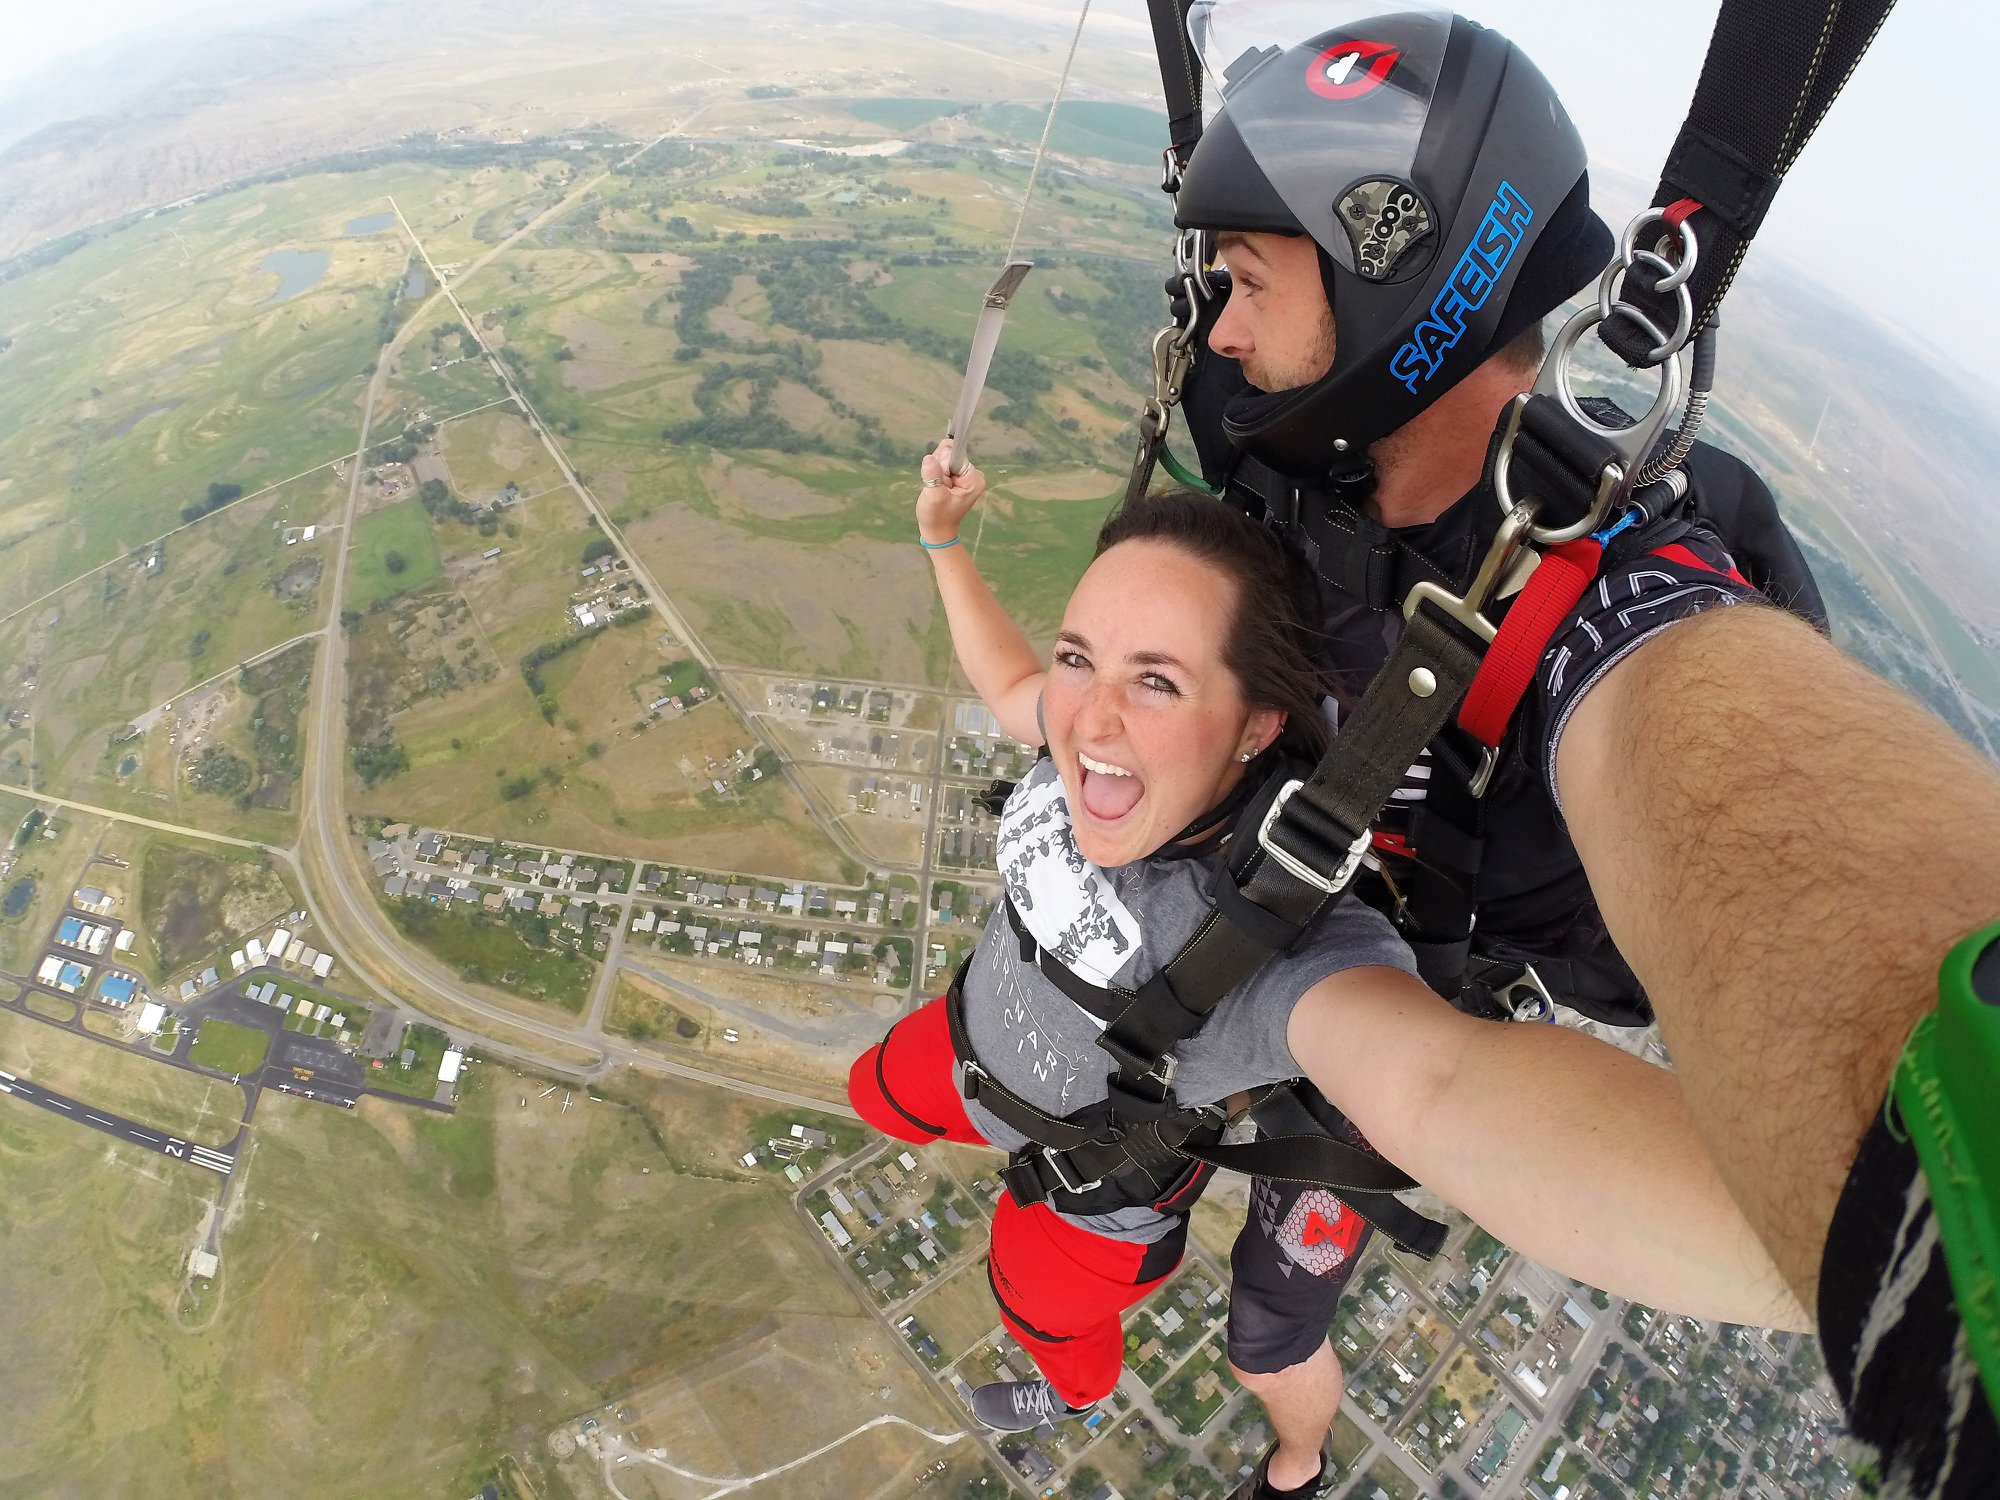 Woman tandem skydiving - DZONE® Skydiving